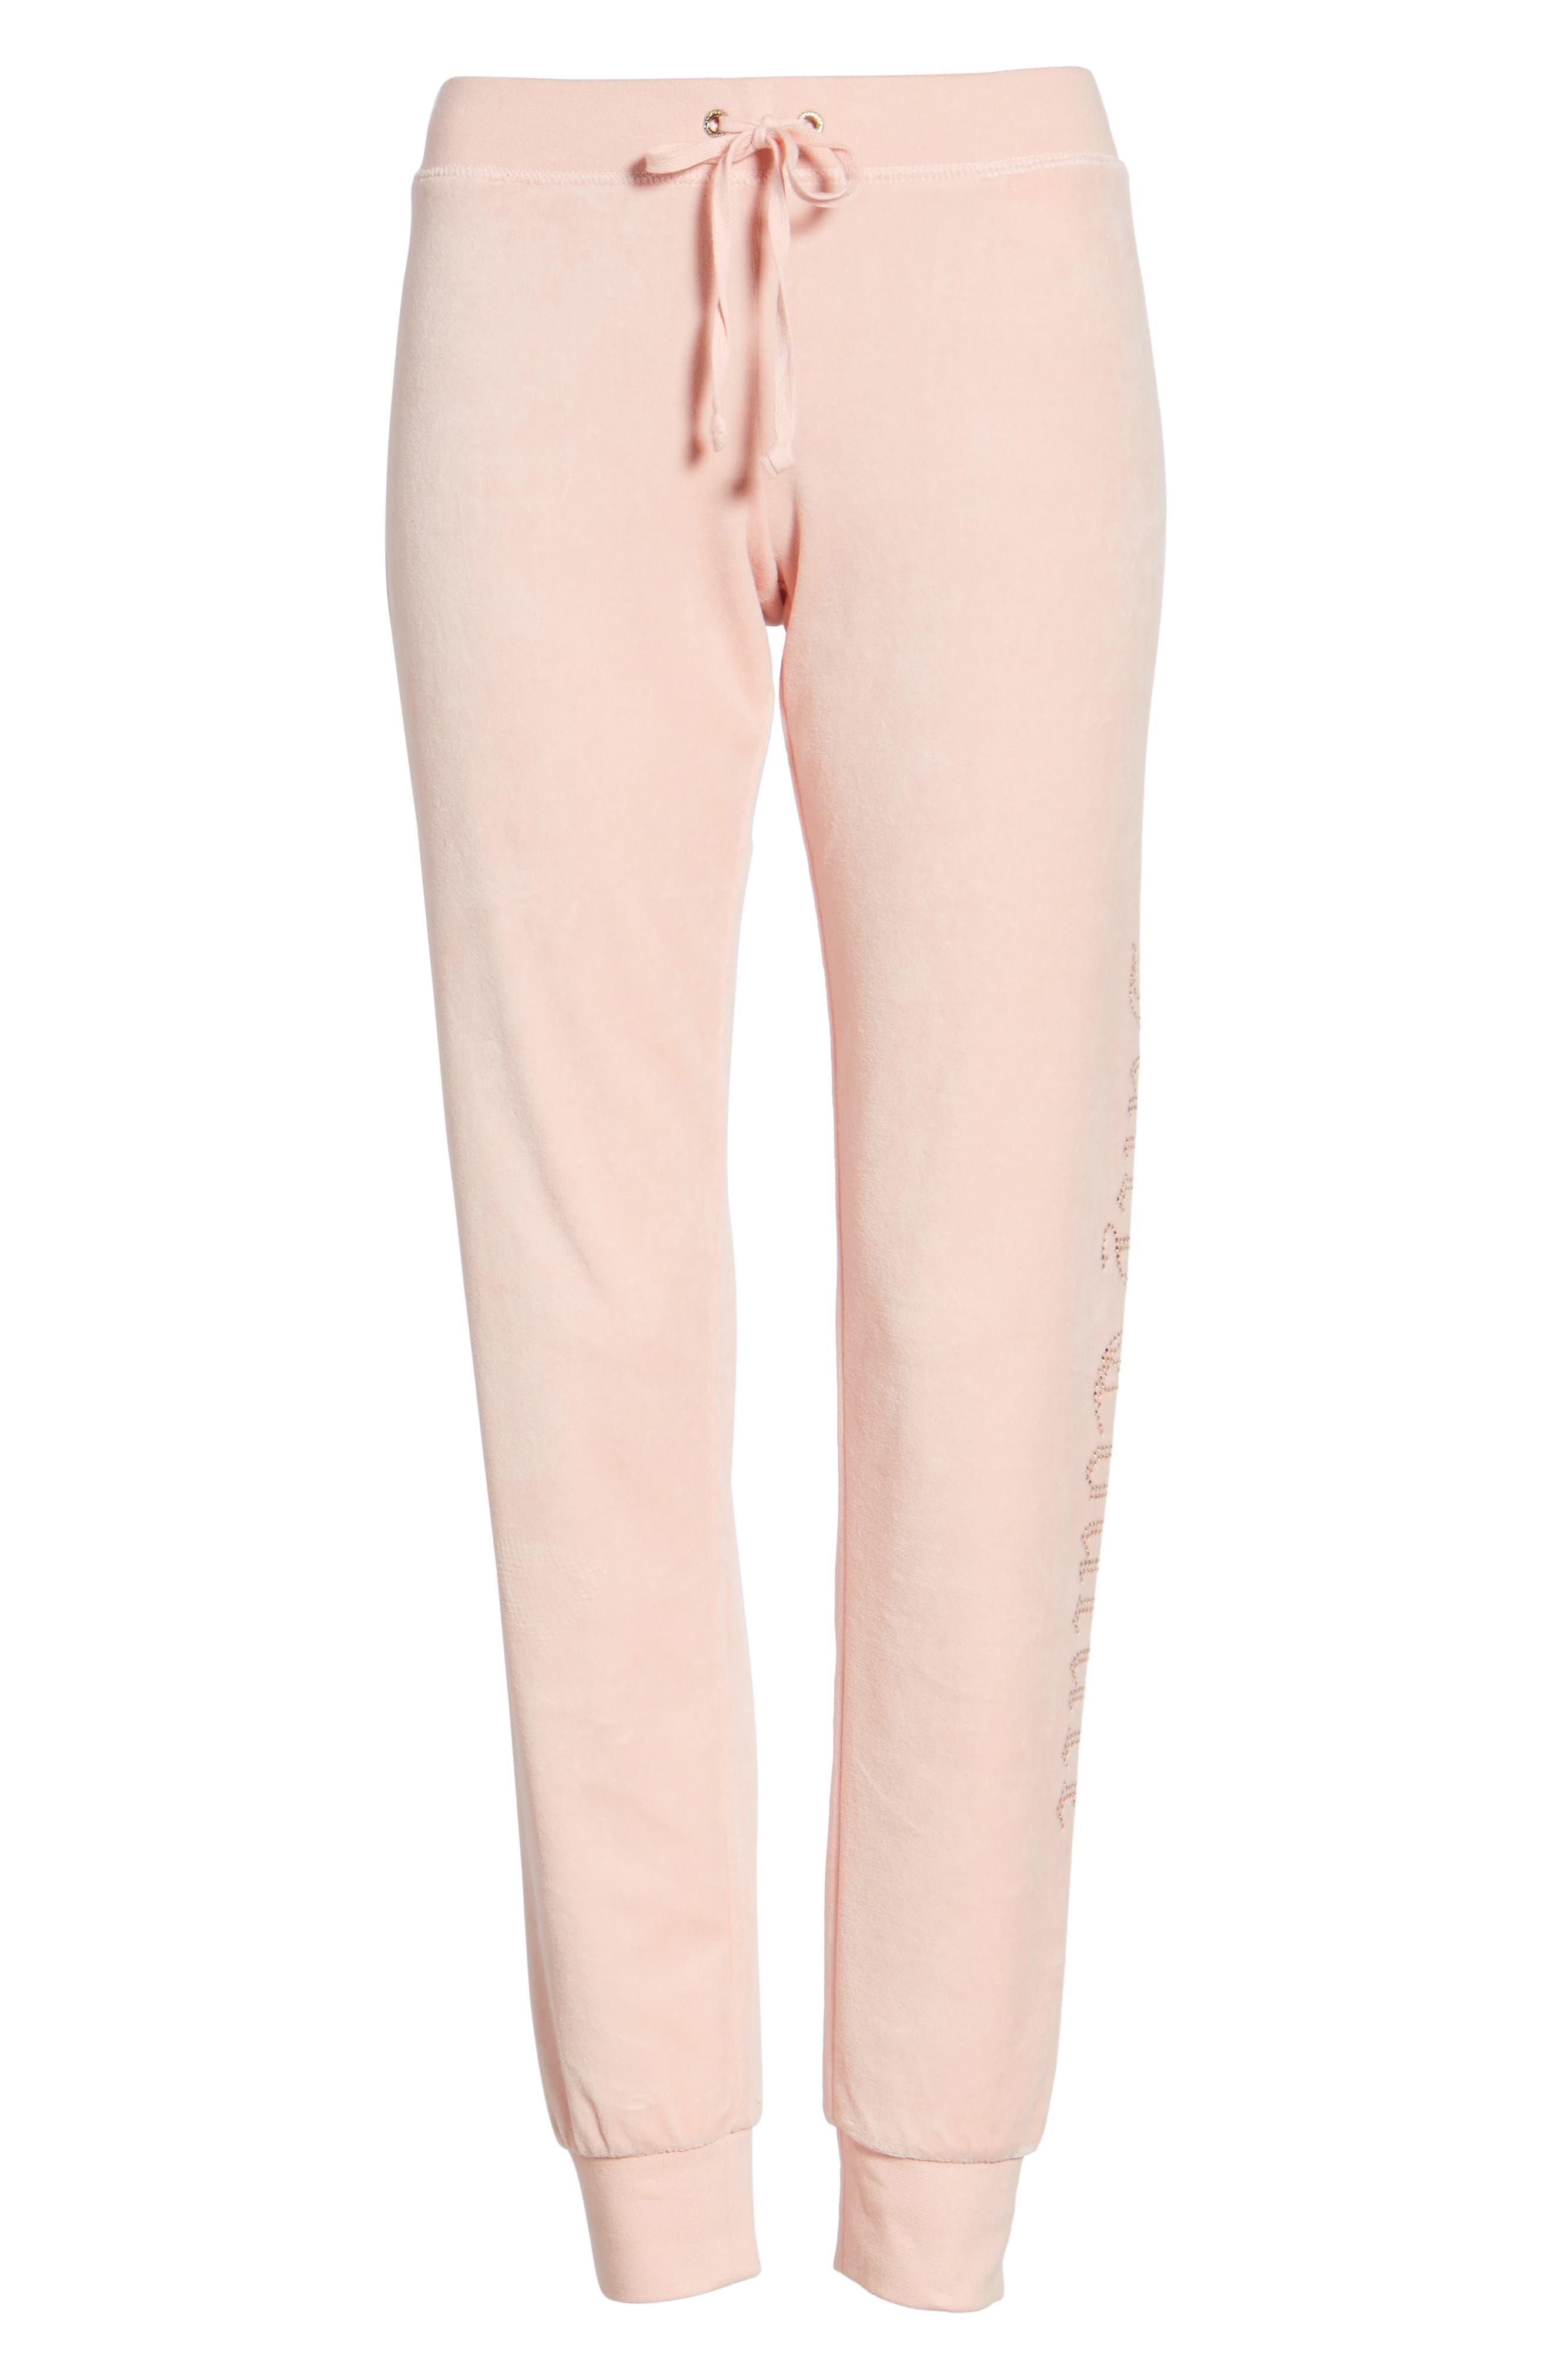 Zuma Crystal Velour Pants,                         Main,                         color, Sugared Icing